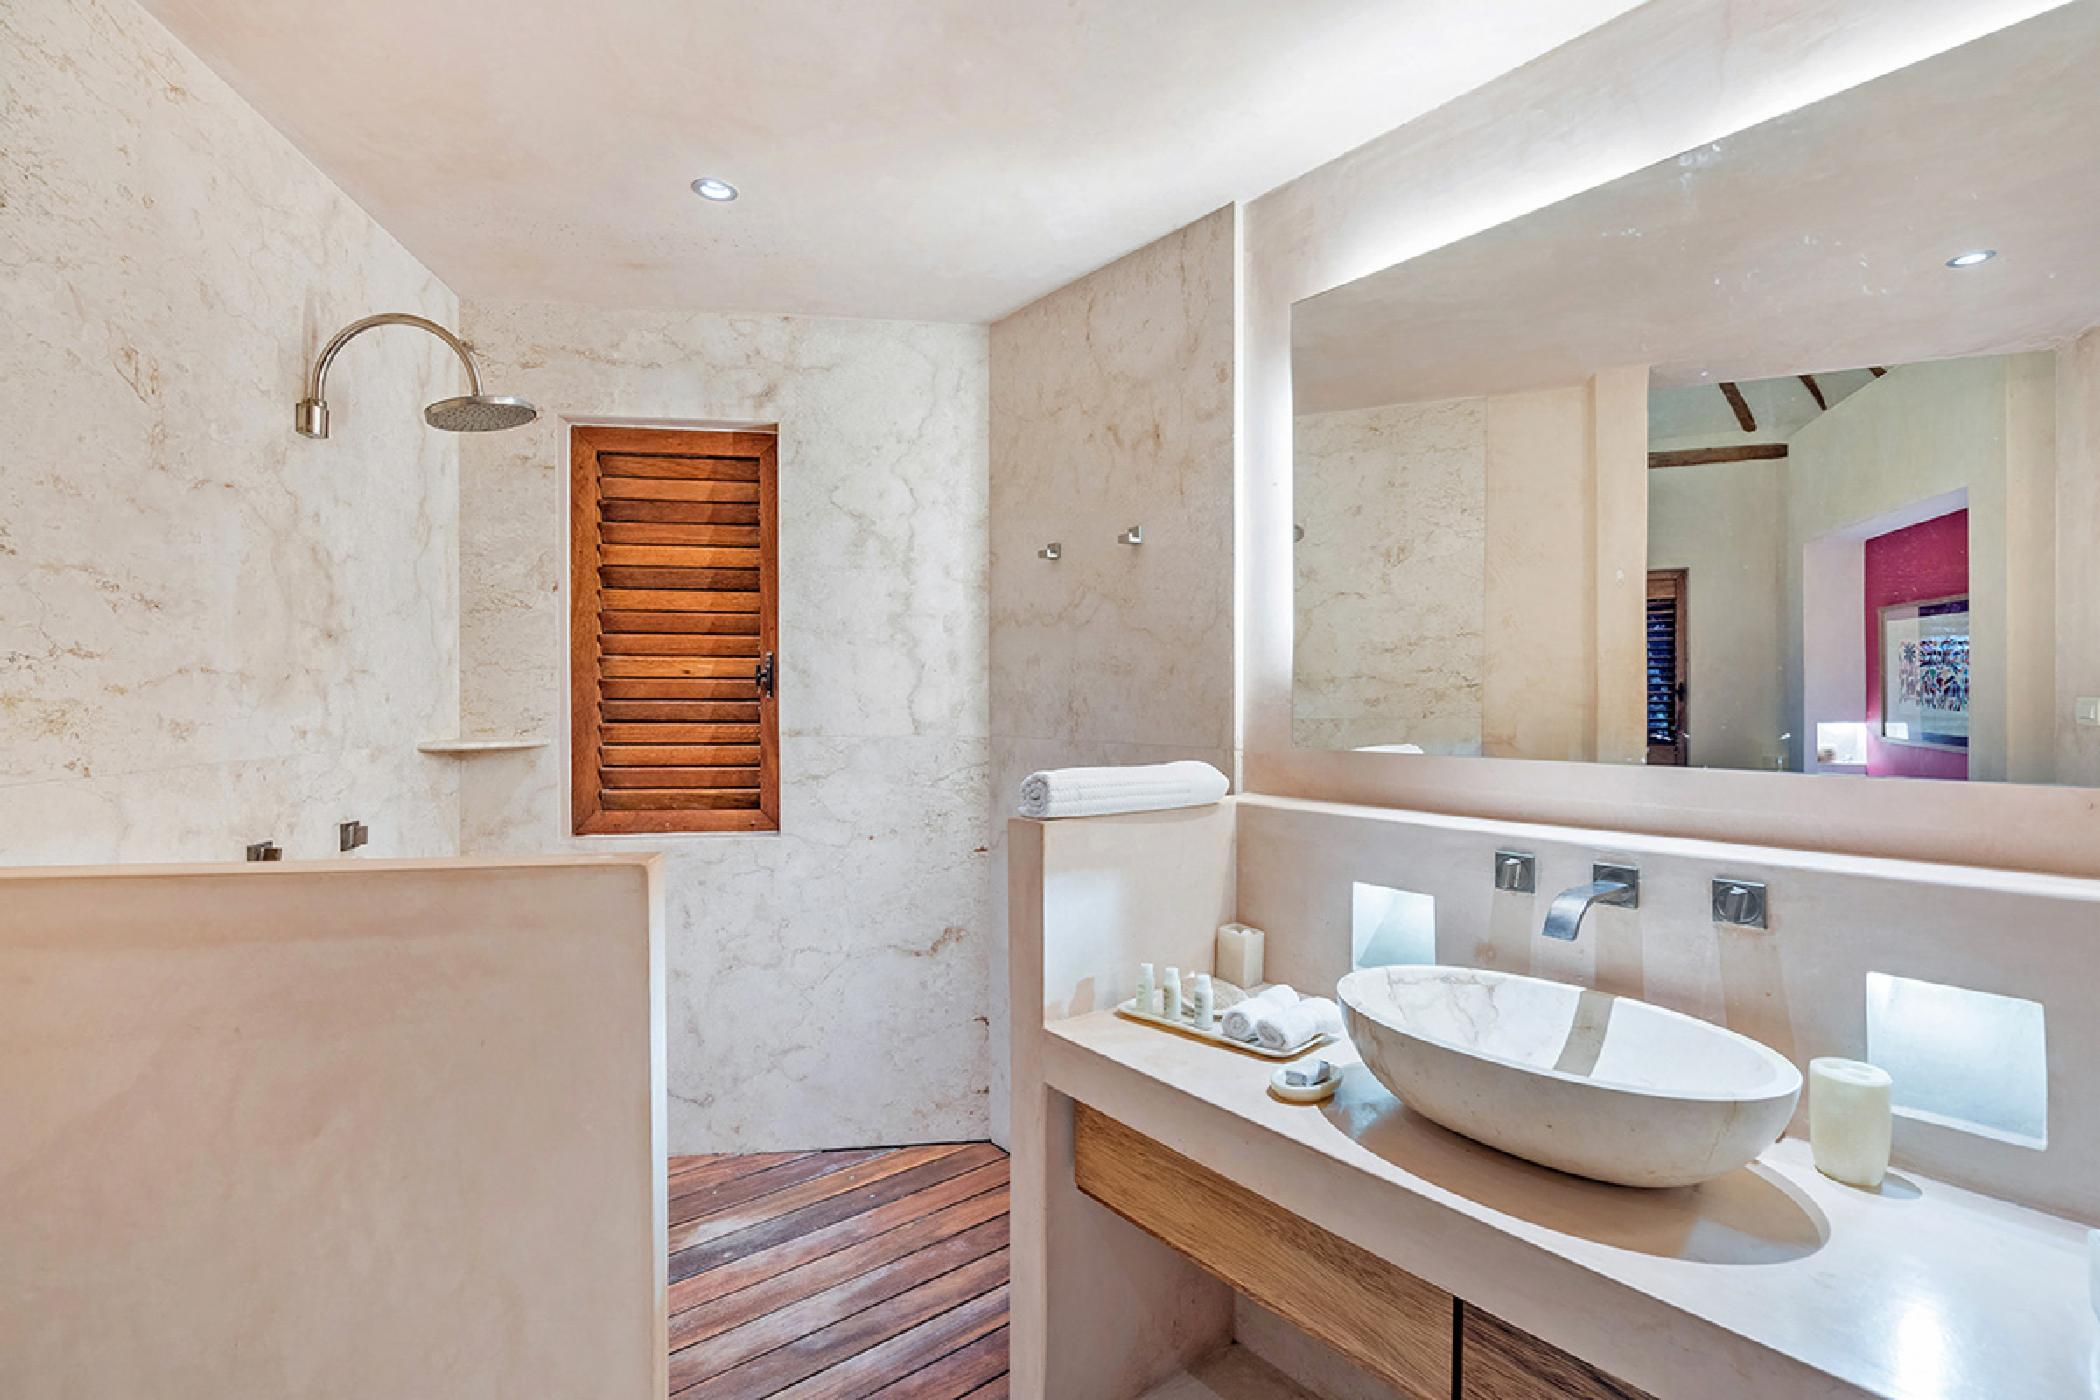 Maya_Luxe_Riviera_Maya_Luxury_Villas_Experiences_Sian_Kaan_Tulum_4_Bedrooms_Casa_Cantarena_20.jpg